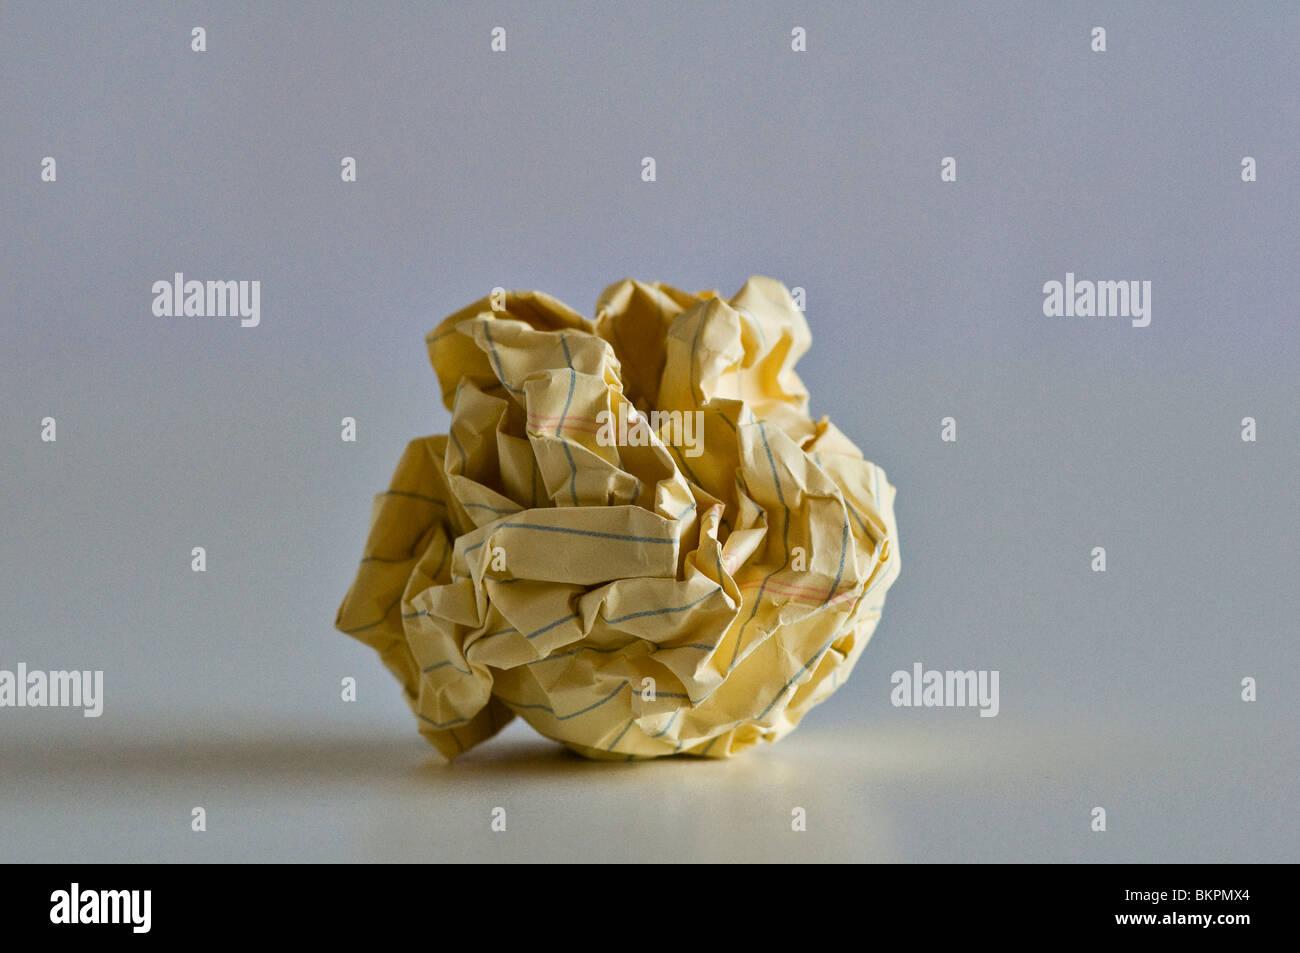 Crumpled yellow paper ball. - Stock Image